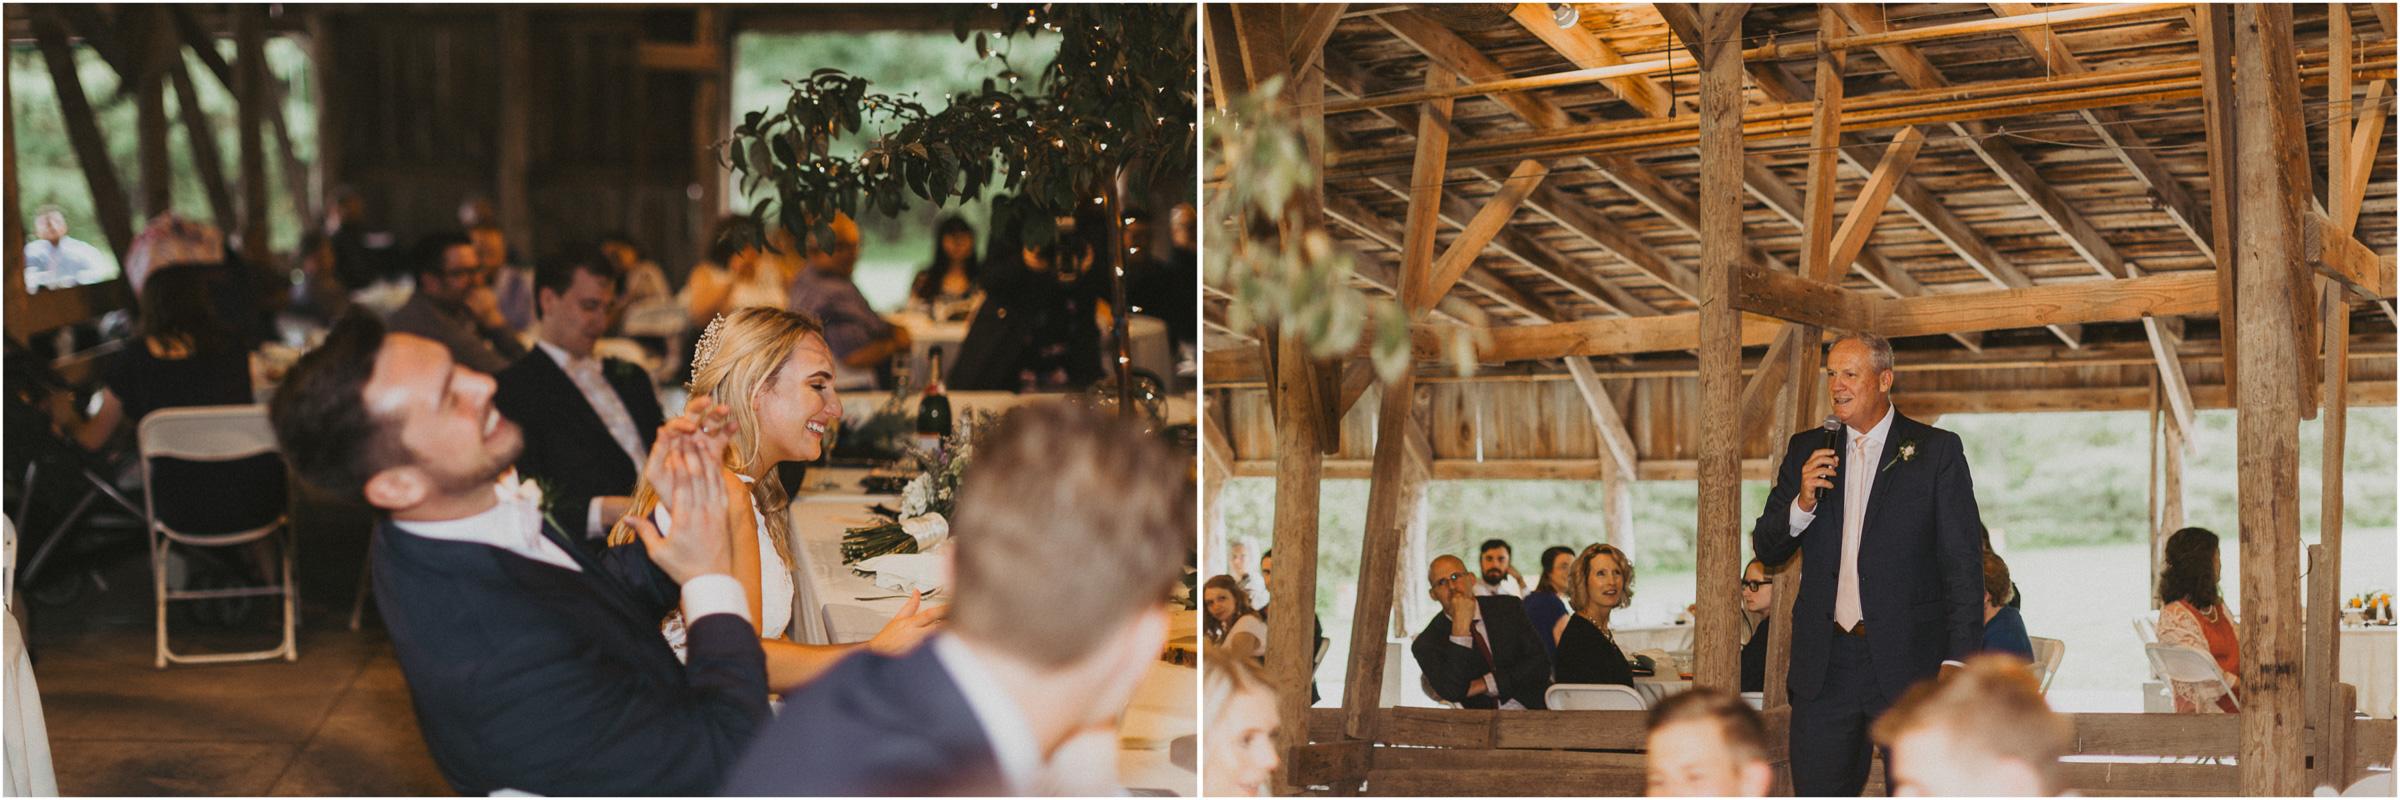 alyssa barletter photography nelson wedding nebraska city lied lodge morton barn spring wedding photographer-53.jpg